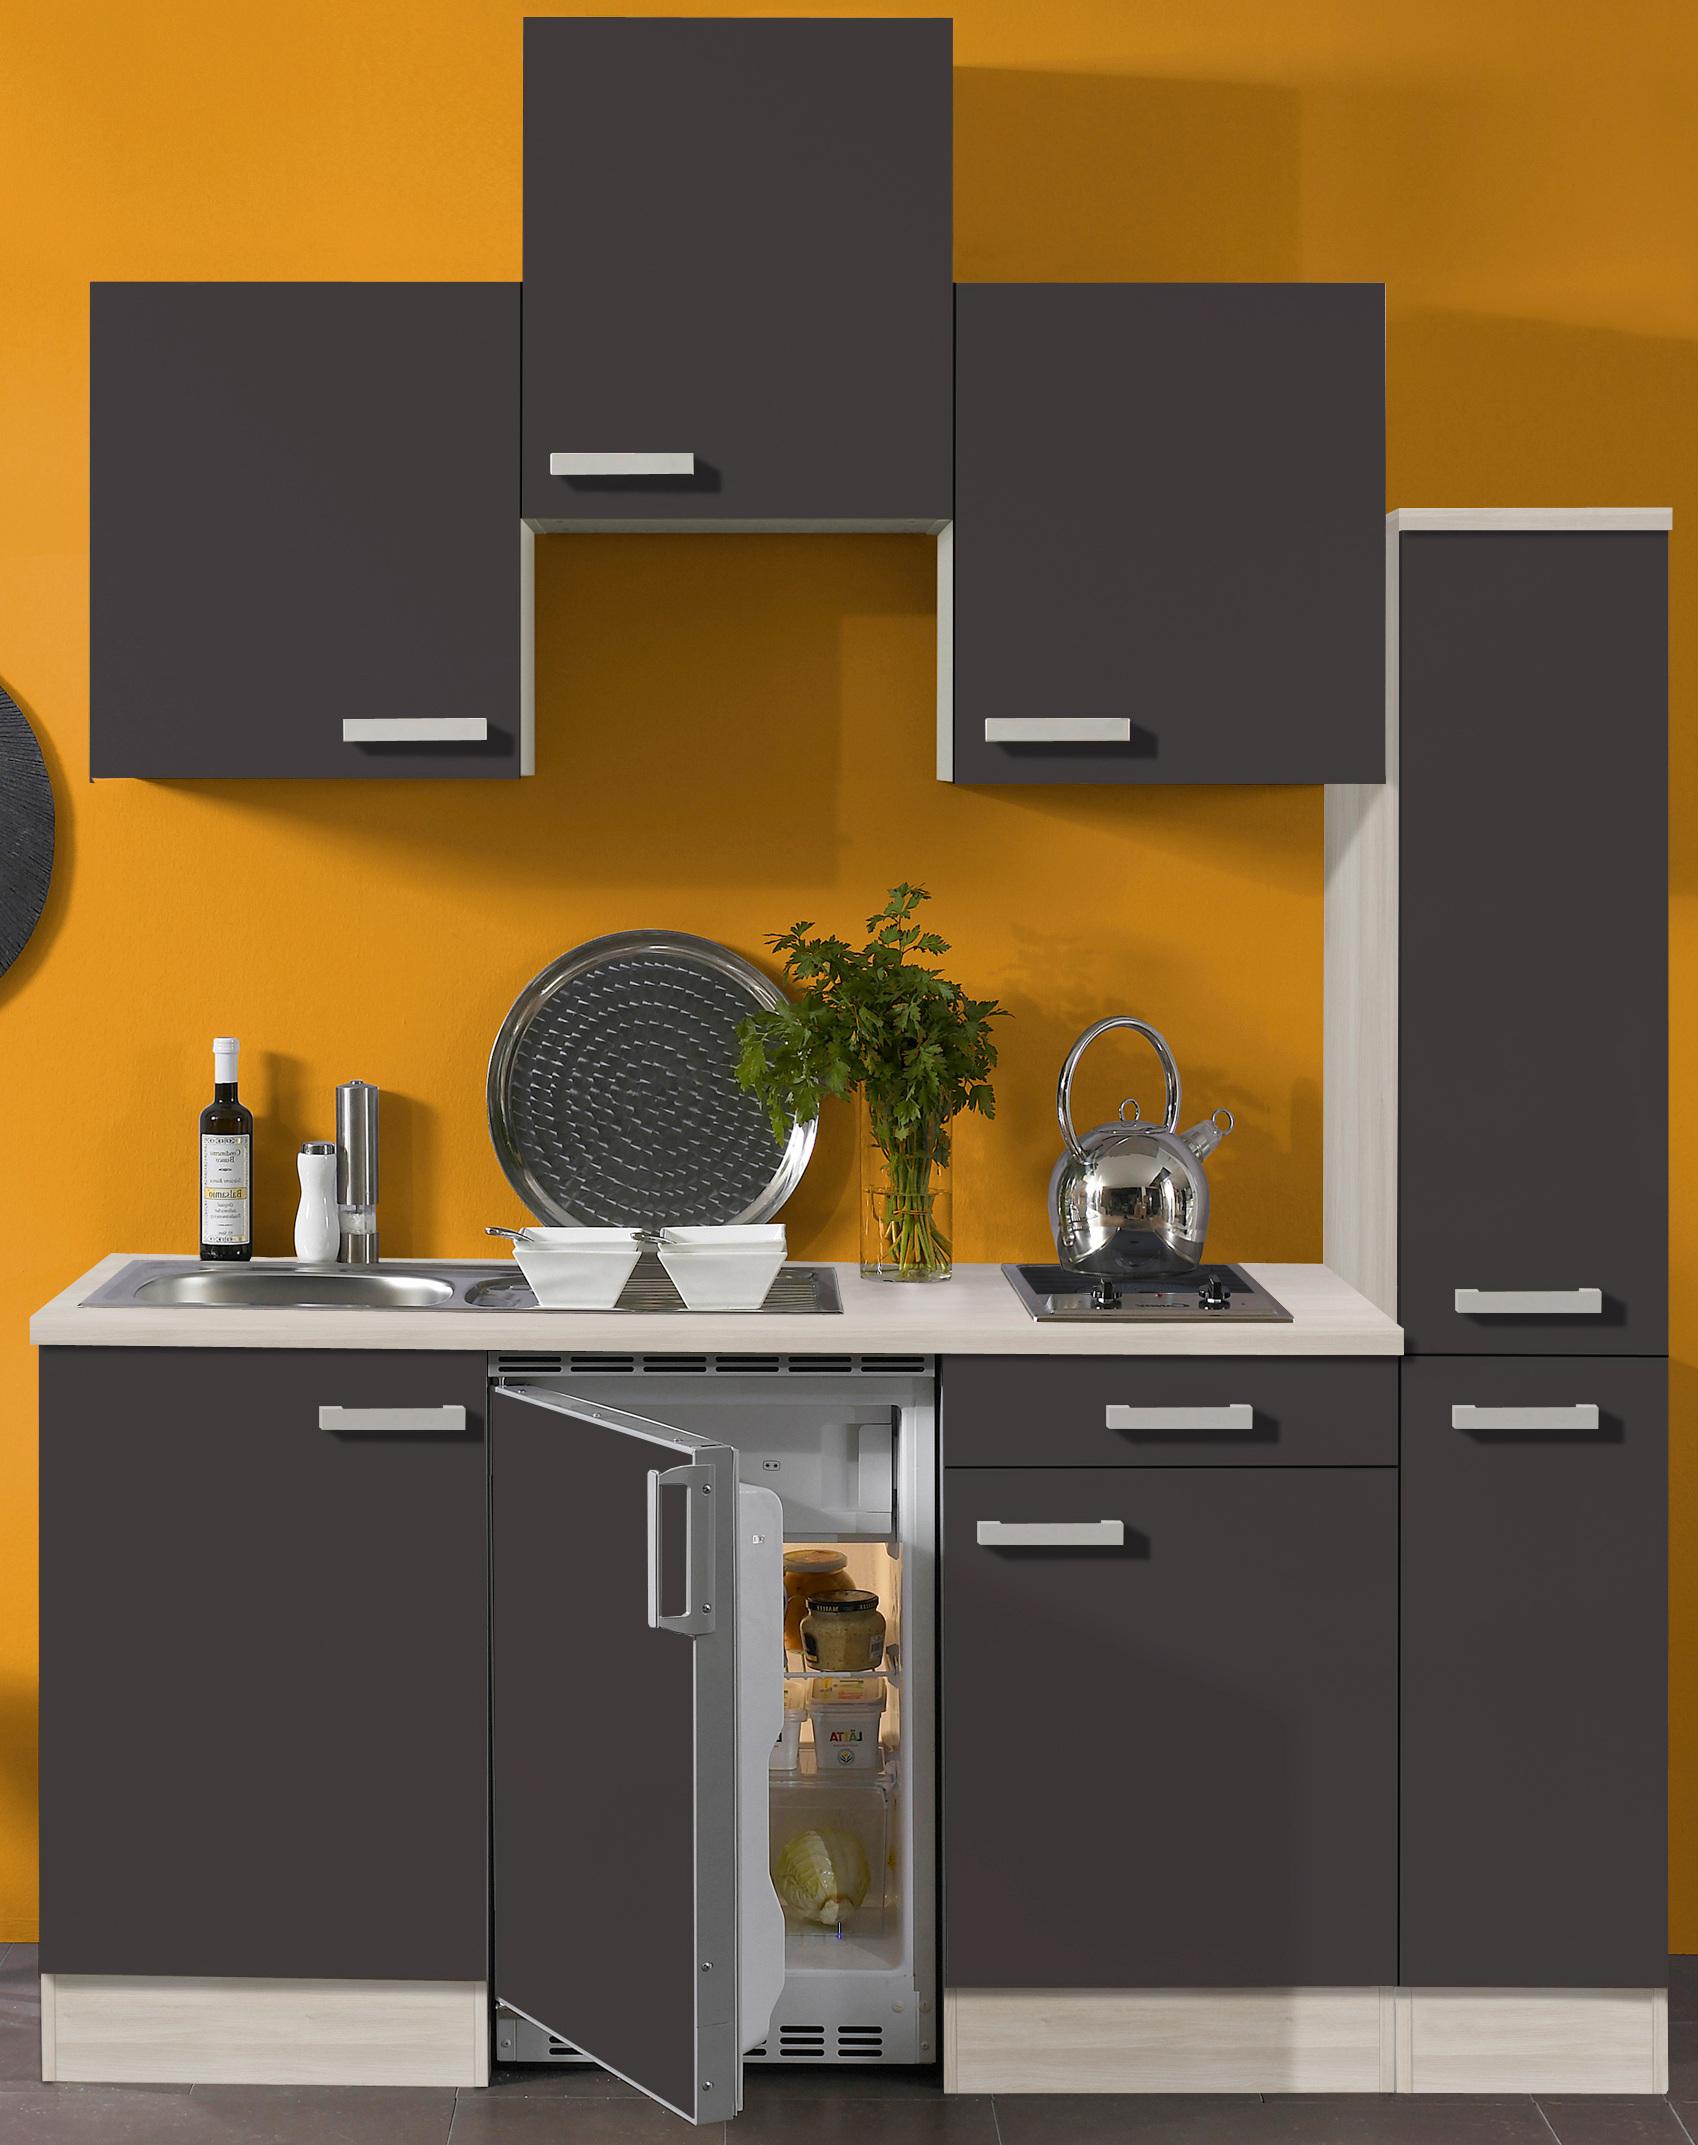 singlek che barcelona vario 1 glaskeramik kochfeld breite 180 cm grau k che singlek chen. Black Bedroom Furniture Sets. Home Design Ideas